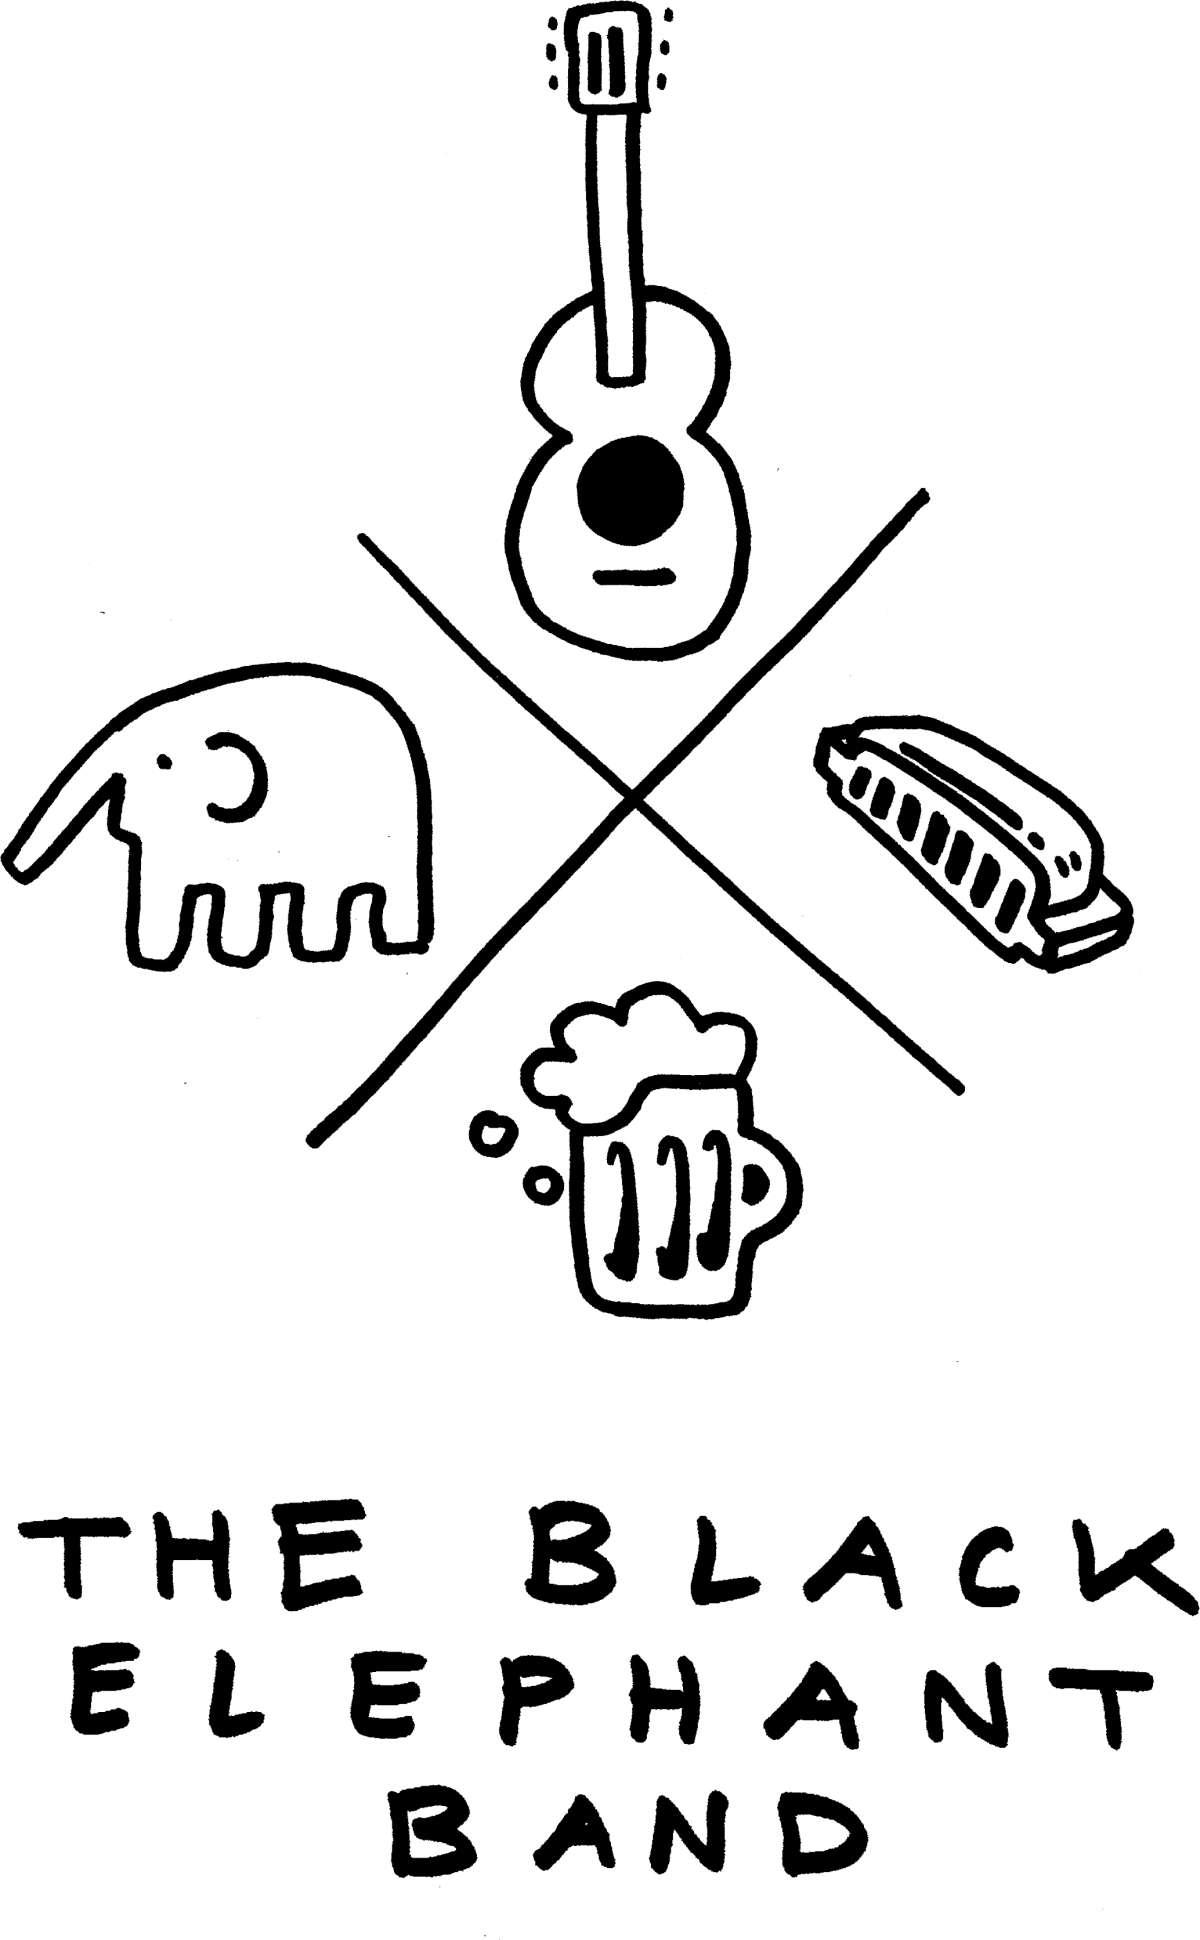 The Black Elephant Band  - Sandershaus  e.V. - Kassel